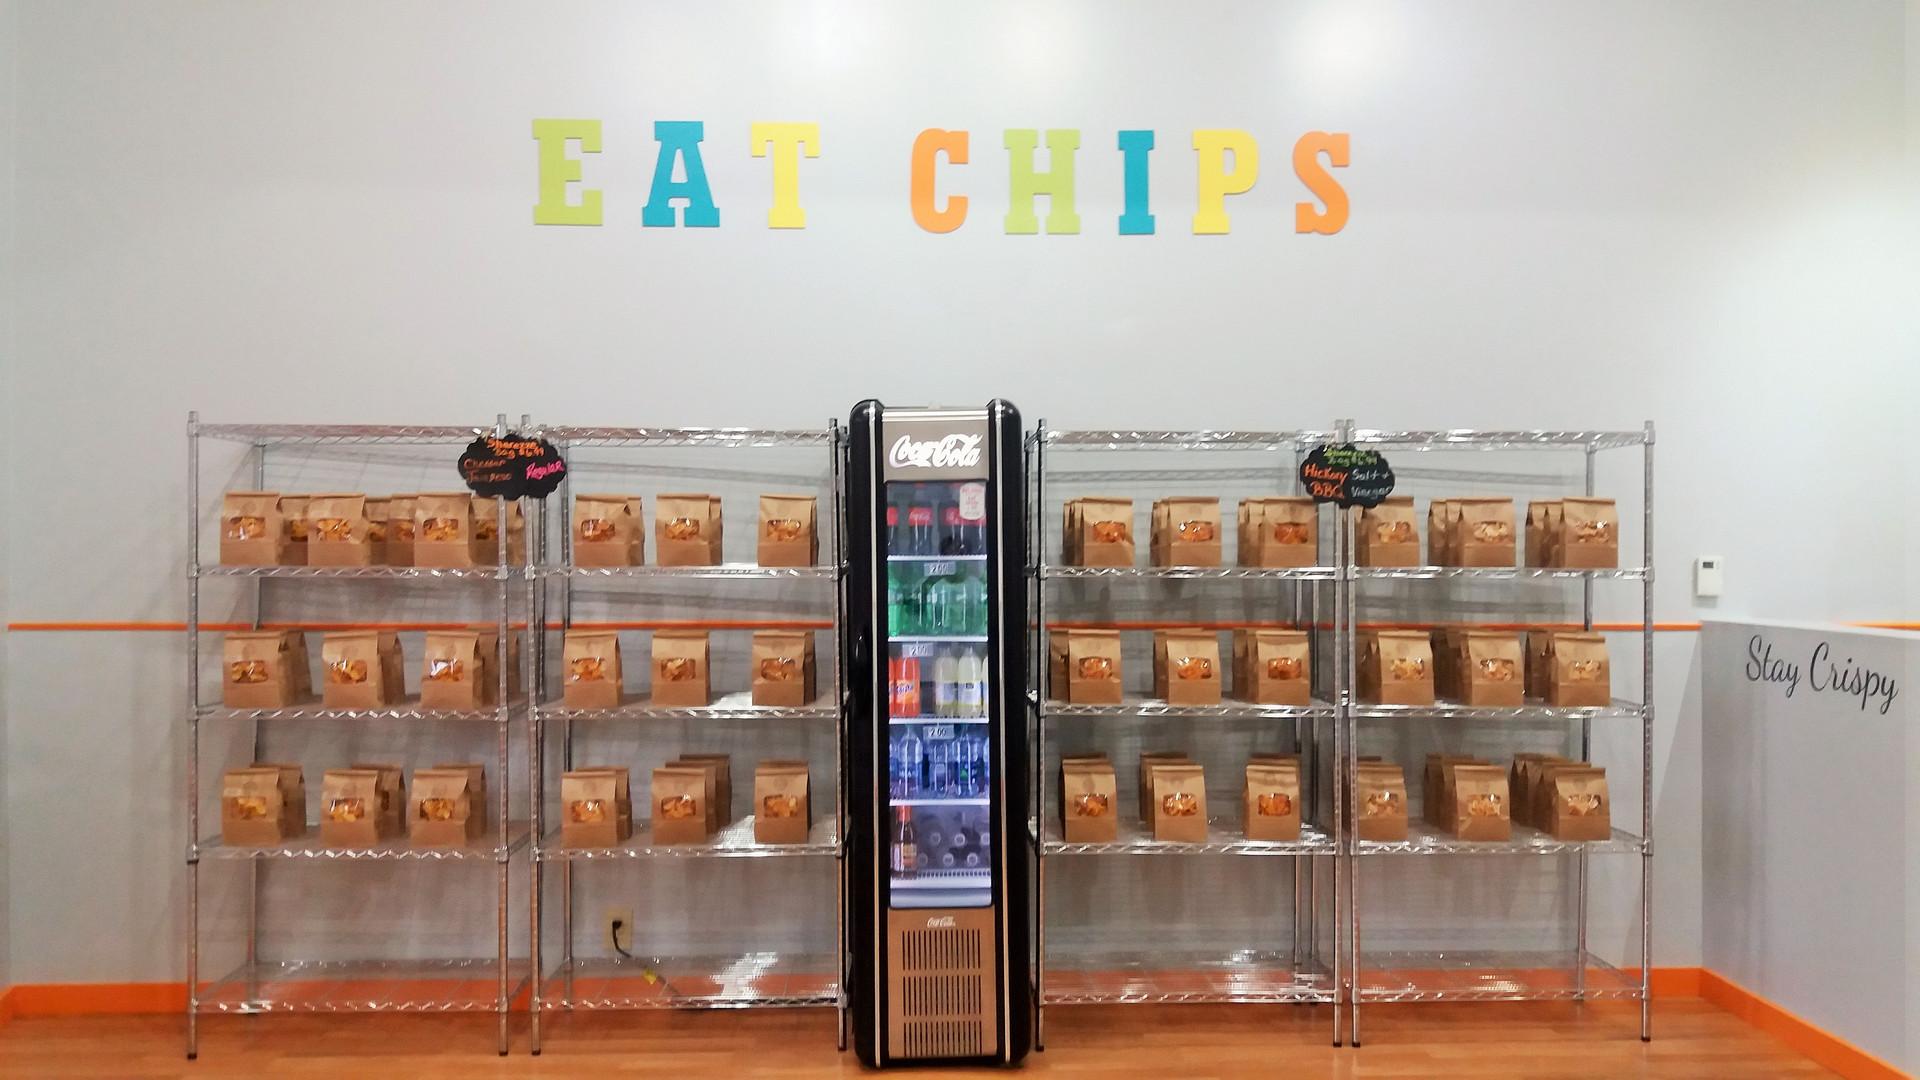 Mack City Chips Store Interior